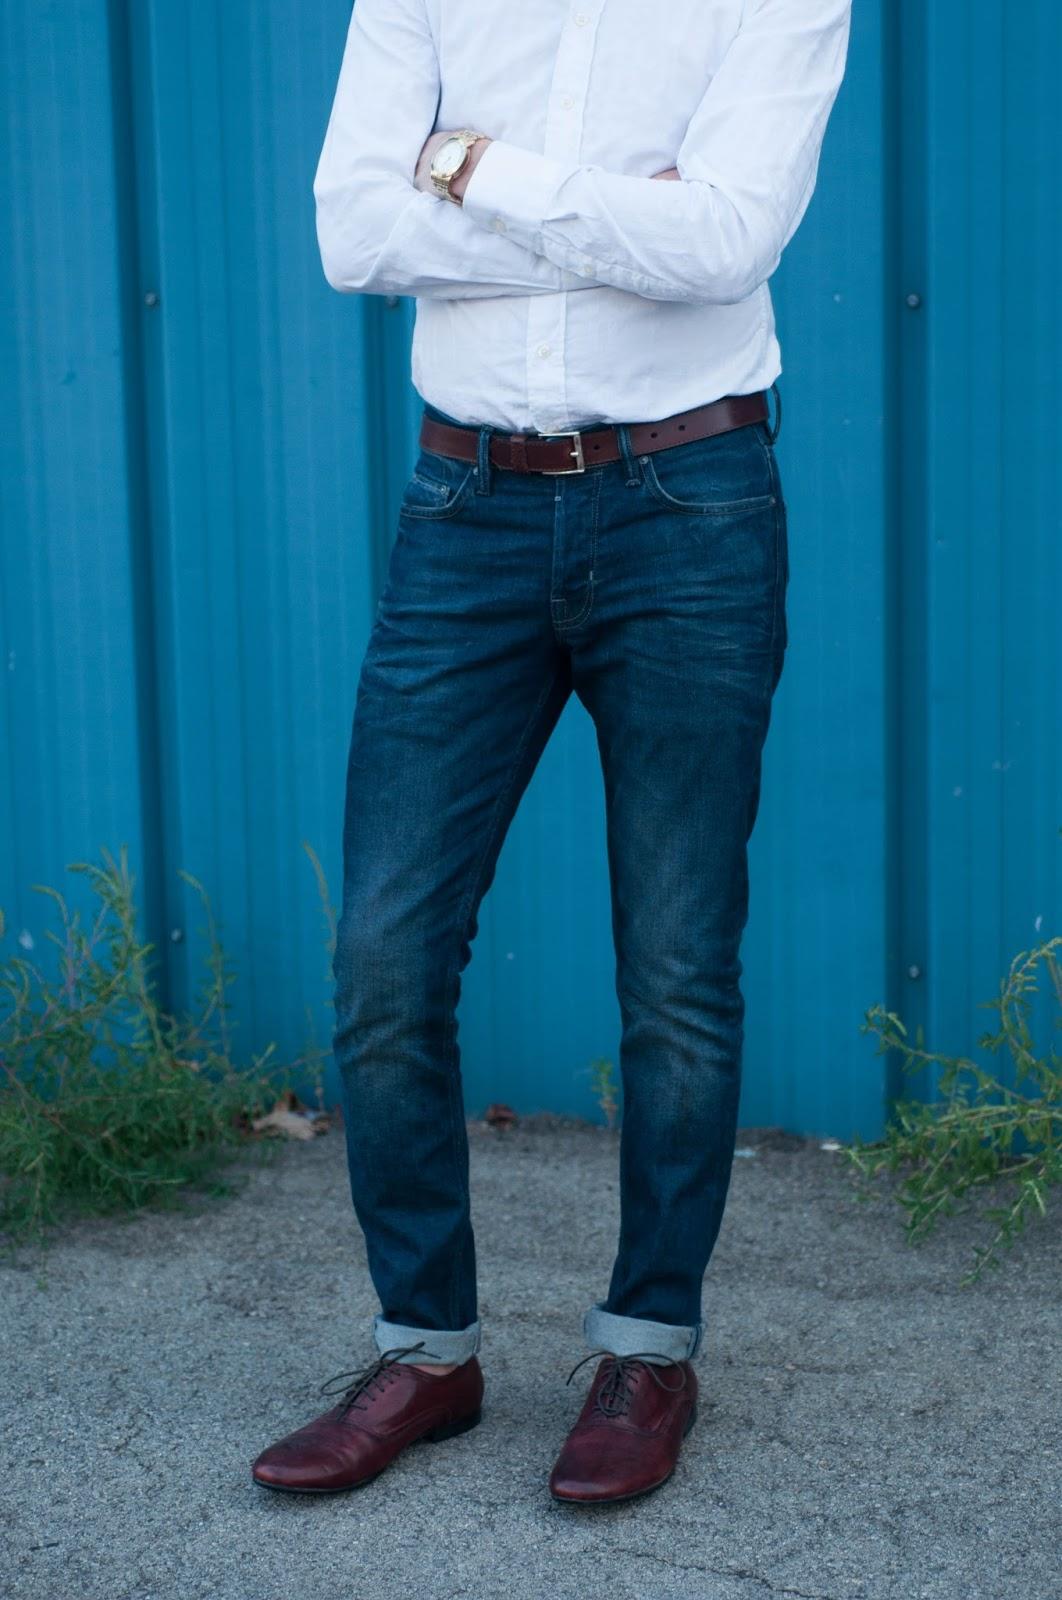 mens style blog, mens fashion blog, ootd, bed stu shoes, burberry mens shirt, all saints jeans